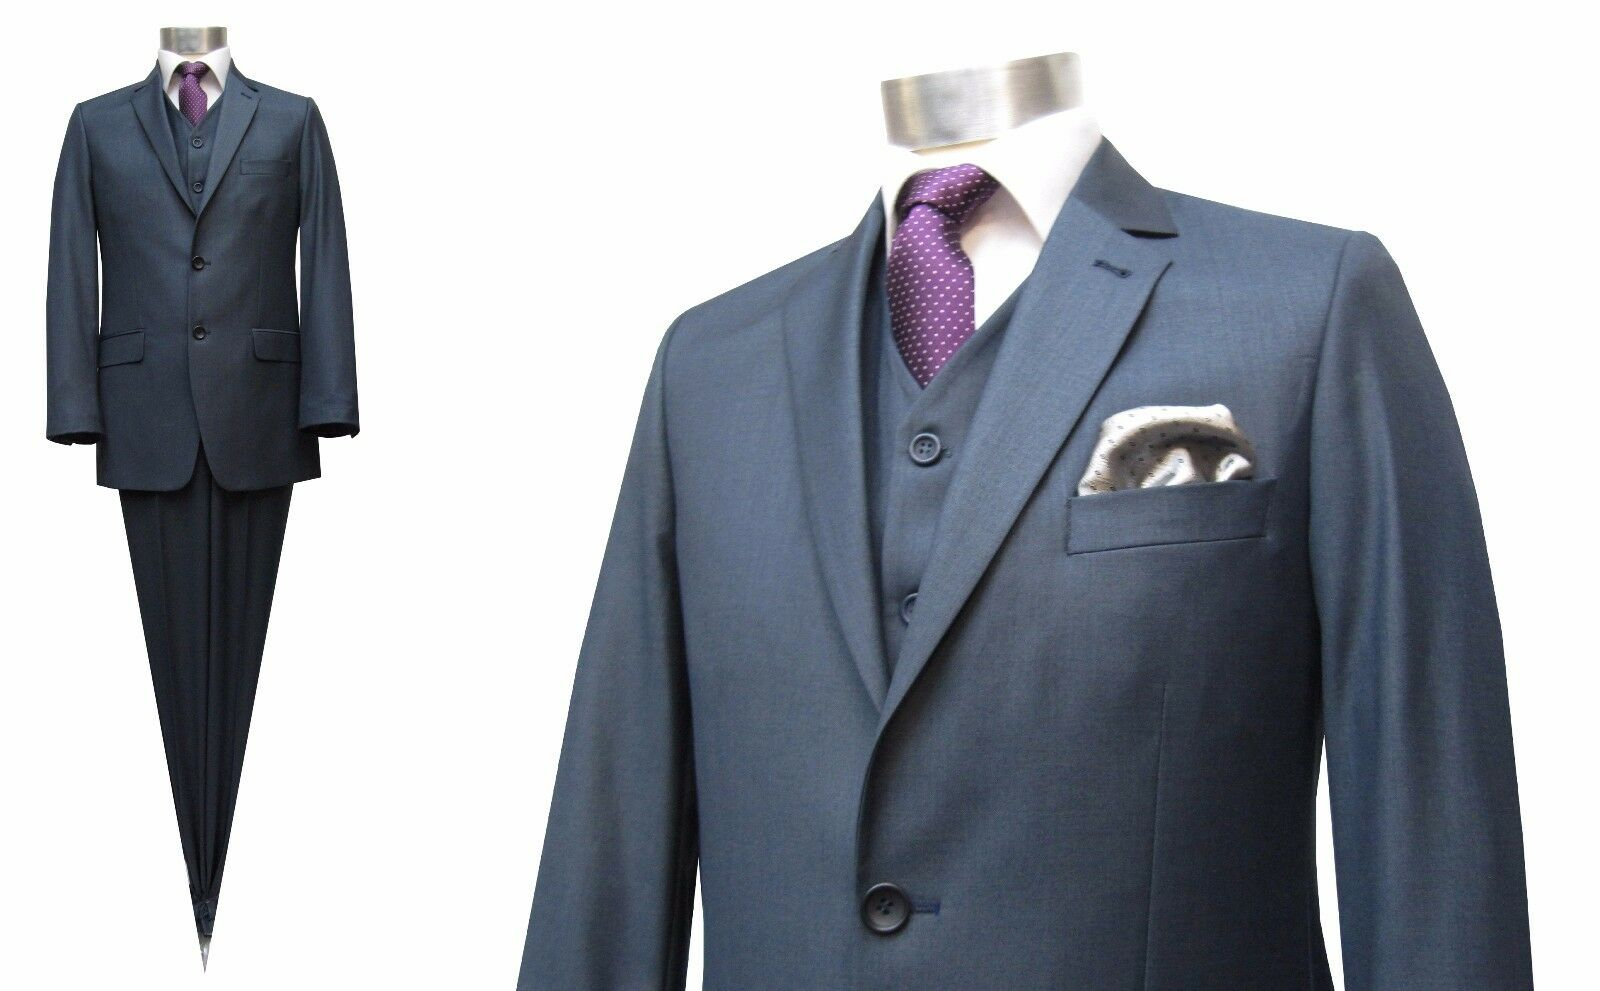 Herren Anzug 3 teilig Gr.46 blaugrau